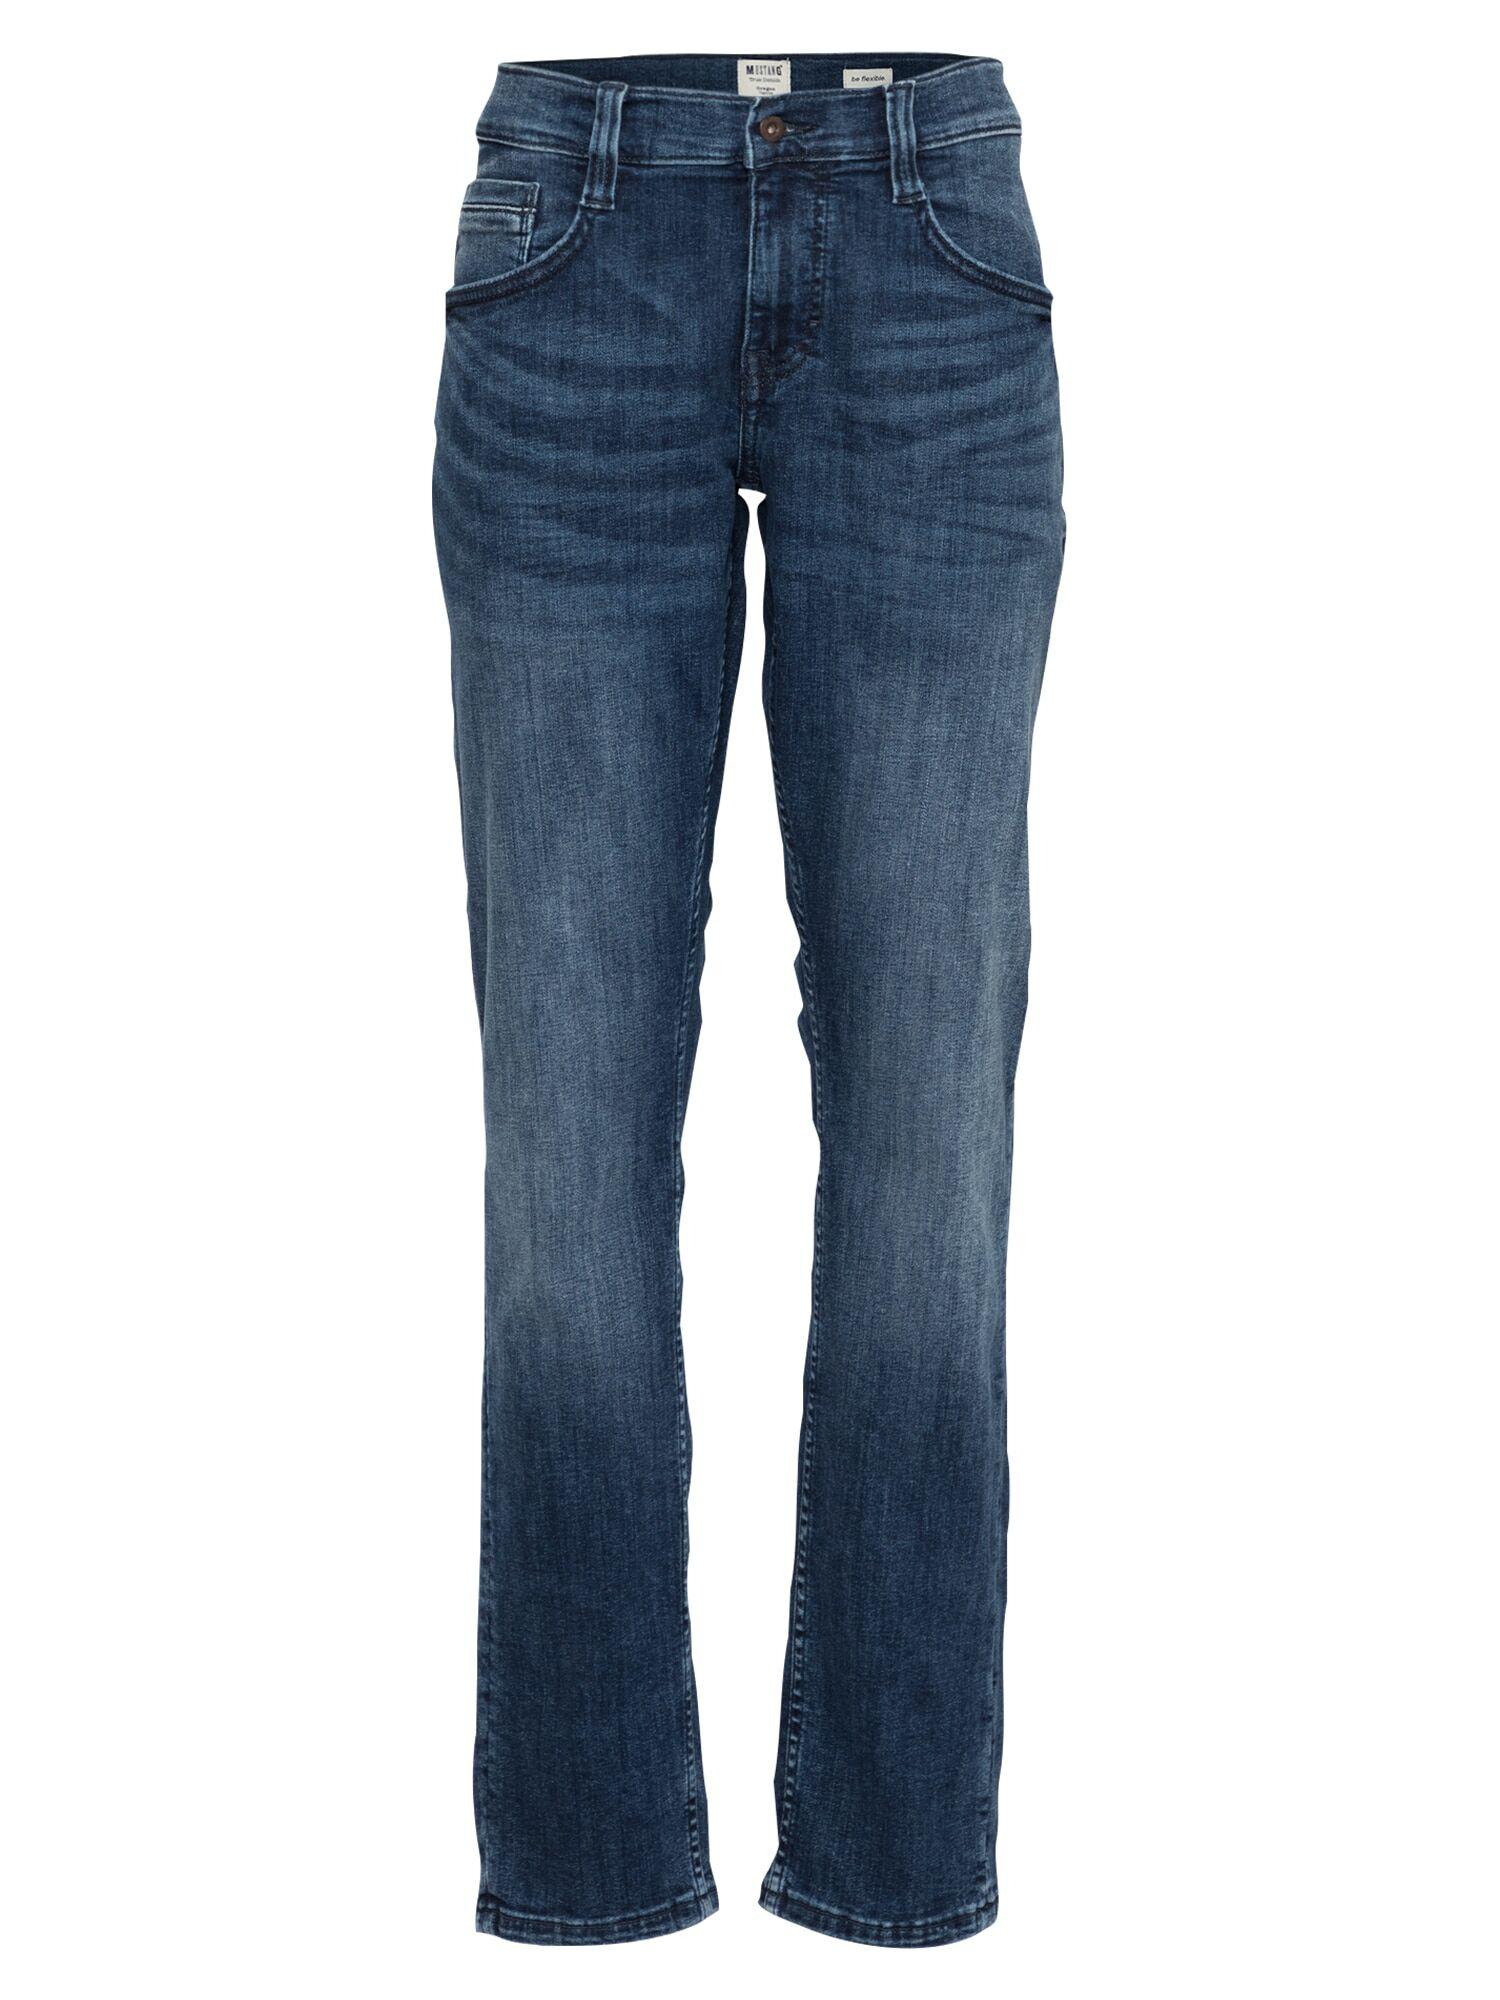 MUSTANG Jean 'Oregon'  - Bleu - Taille: 38/32 - male